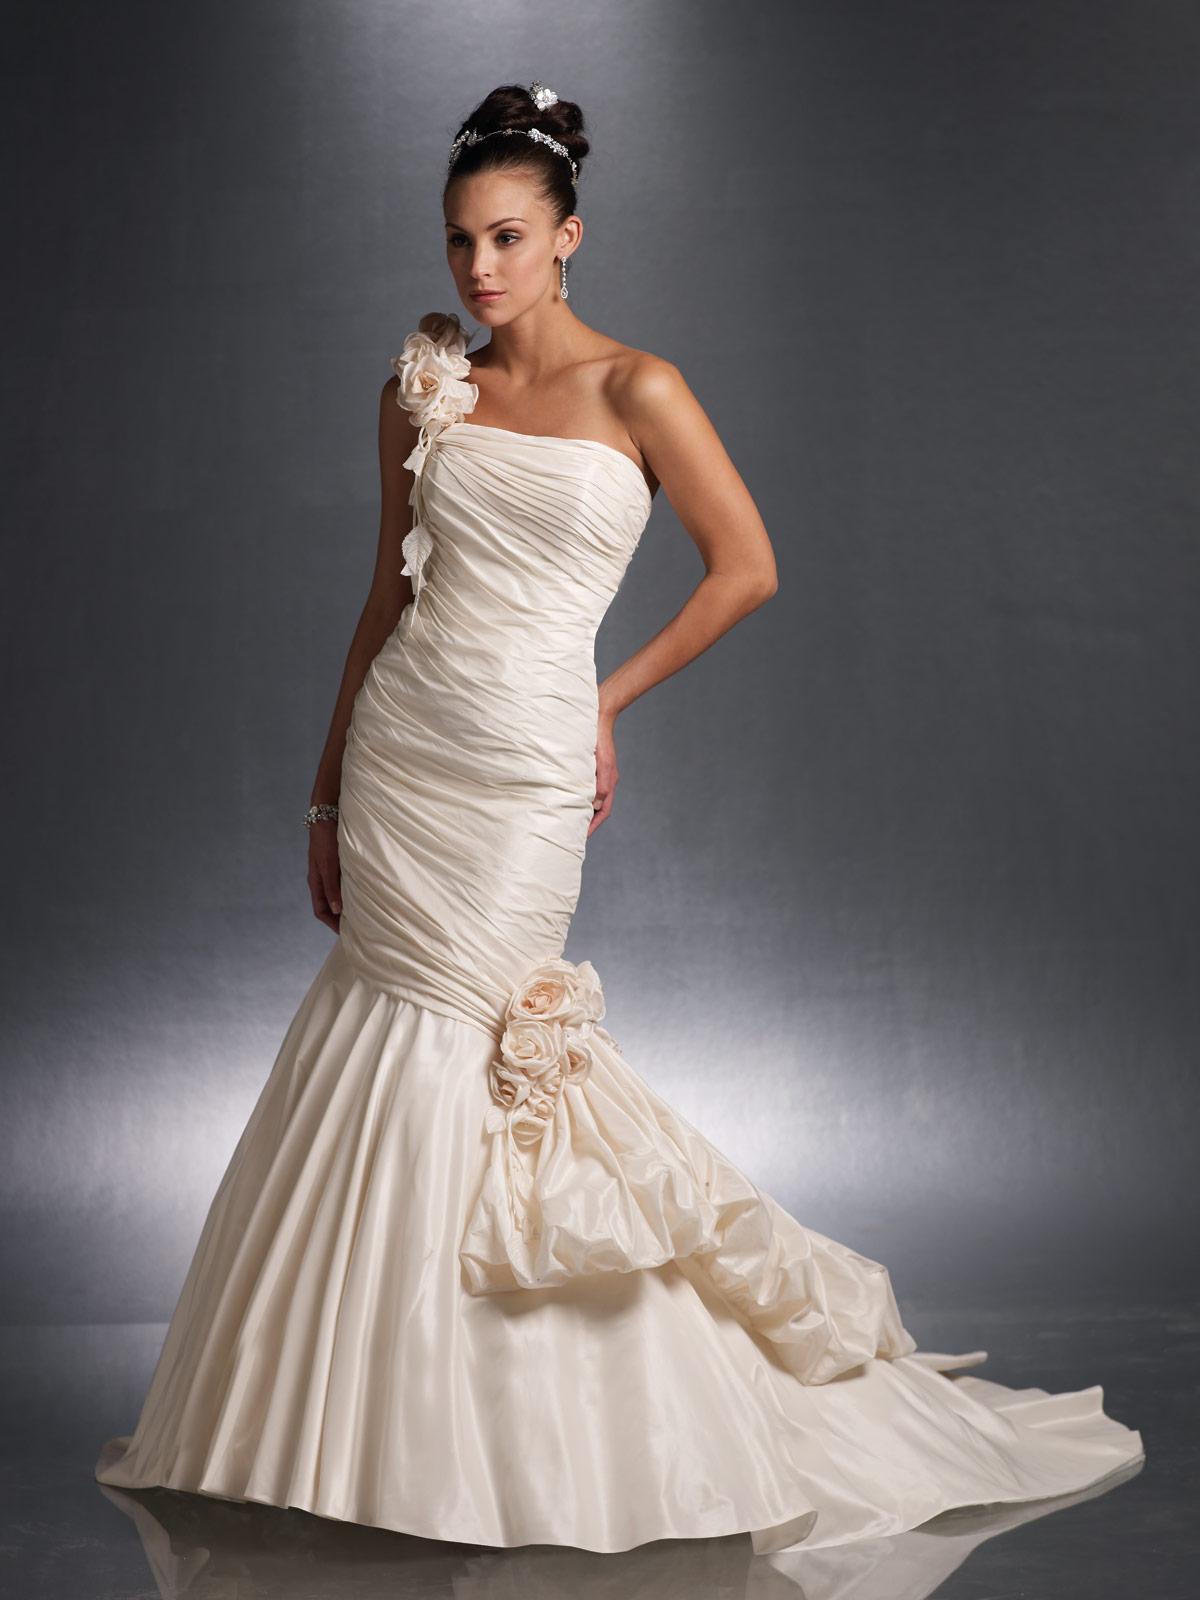 Classic wedding dress contemporary mermaid wedding dresses for How to display a wedding dress